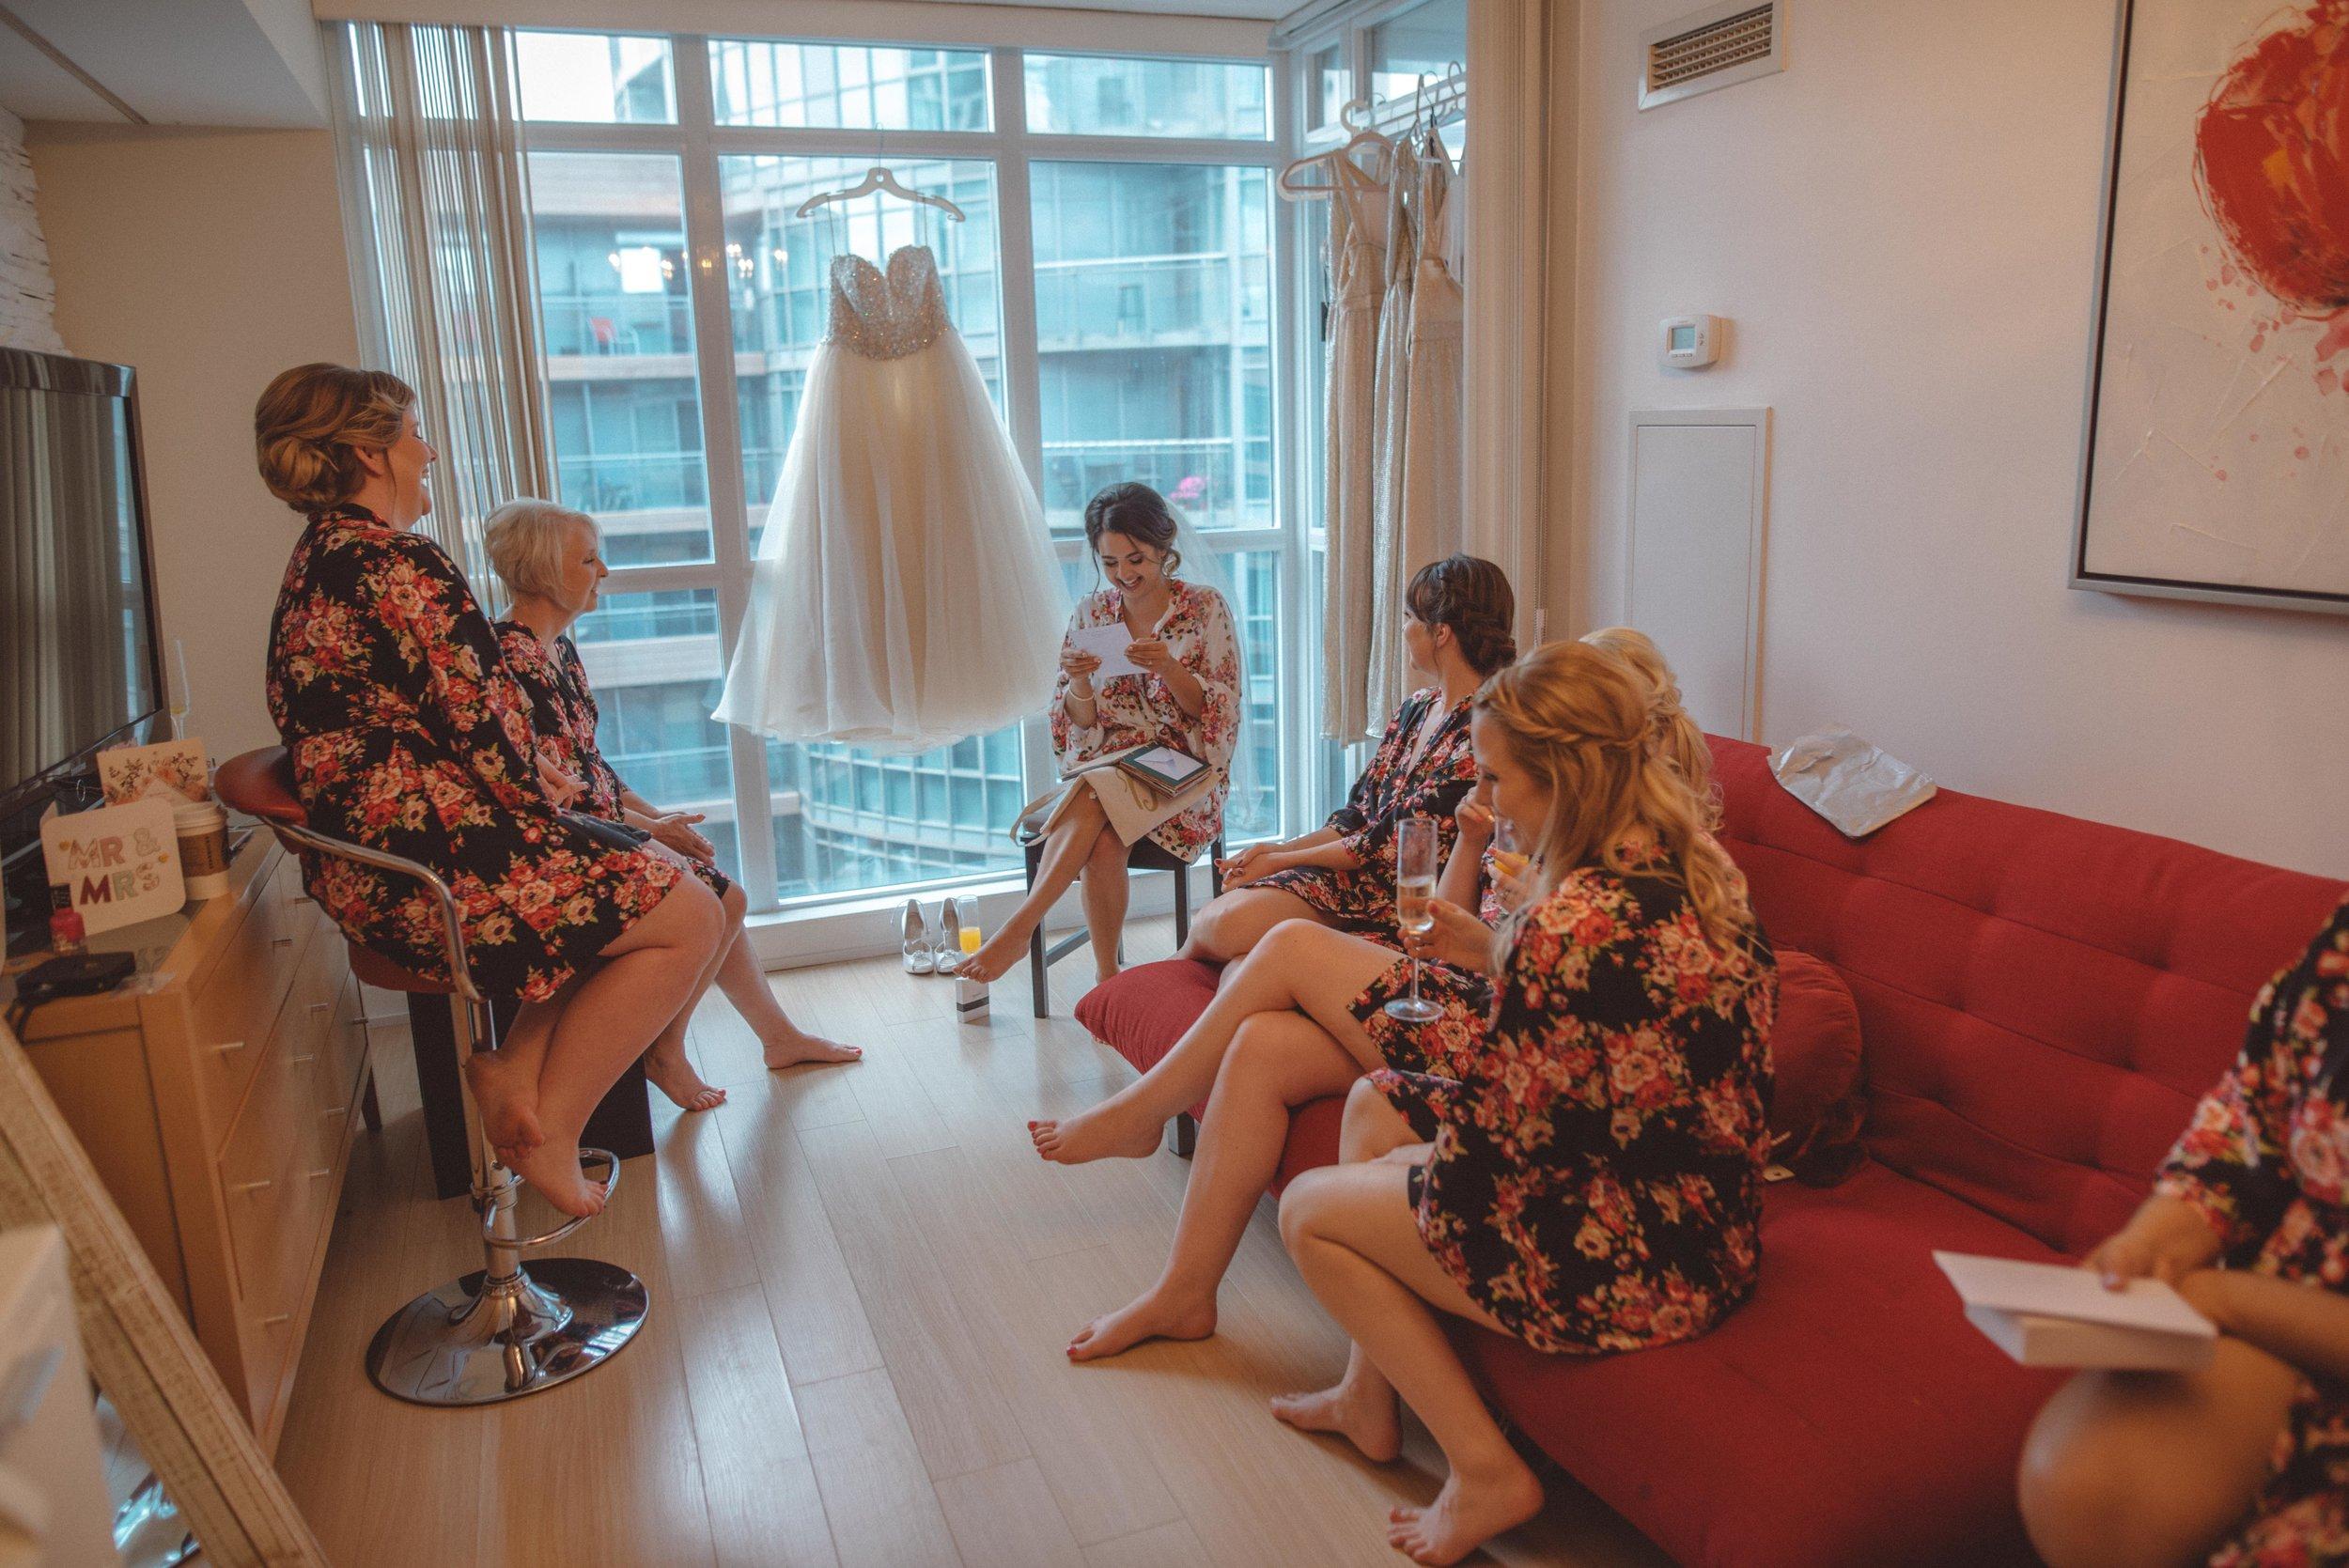 mariage_photographe_toronto_gatineau_ottawa_photographer_wedding-70.jpg